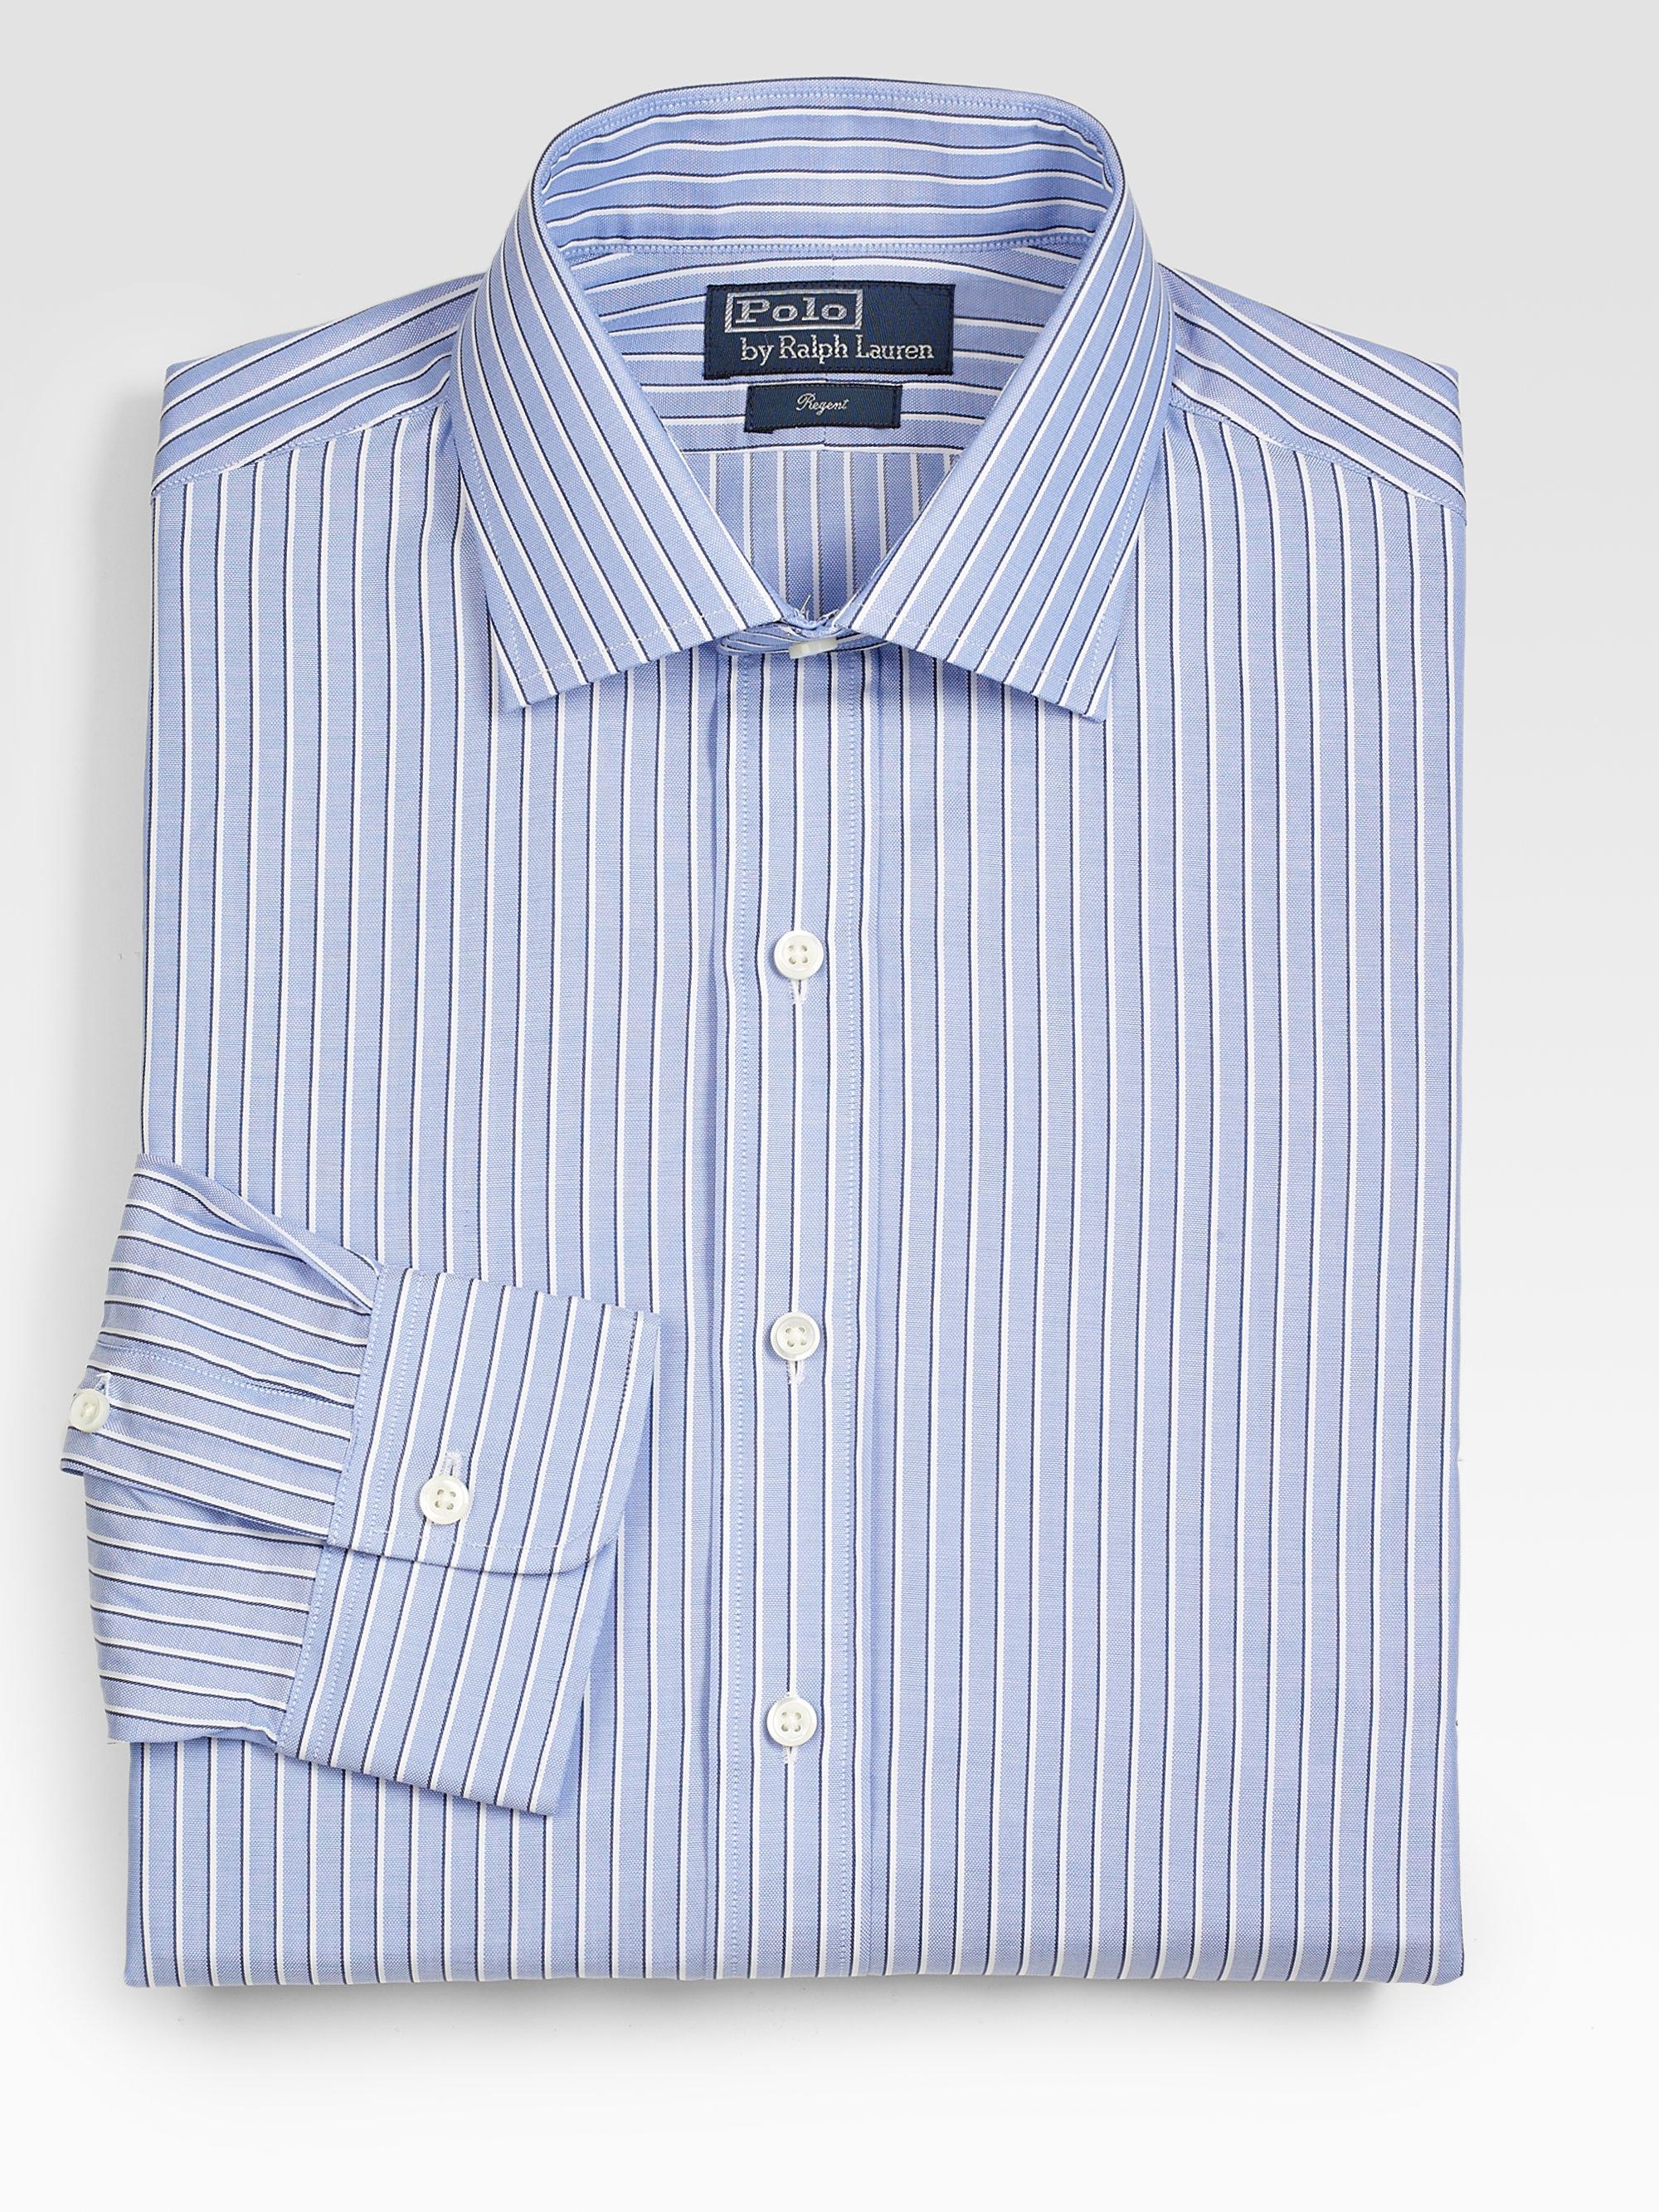 Polo ralph lauren customfit striped regent shirt in blue for Custom fit dress shirts